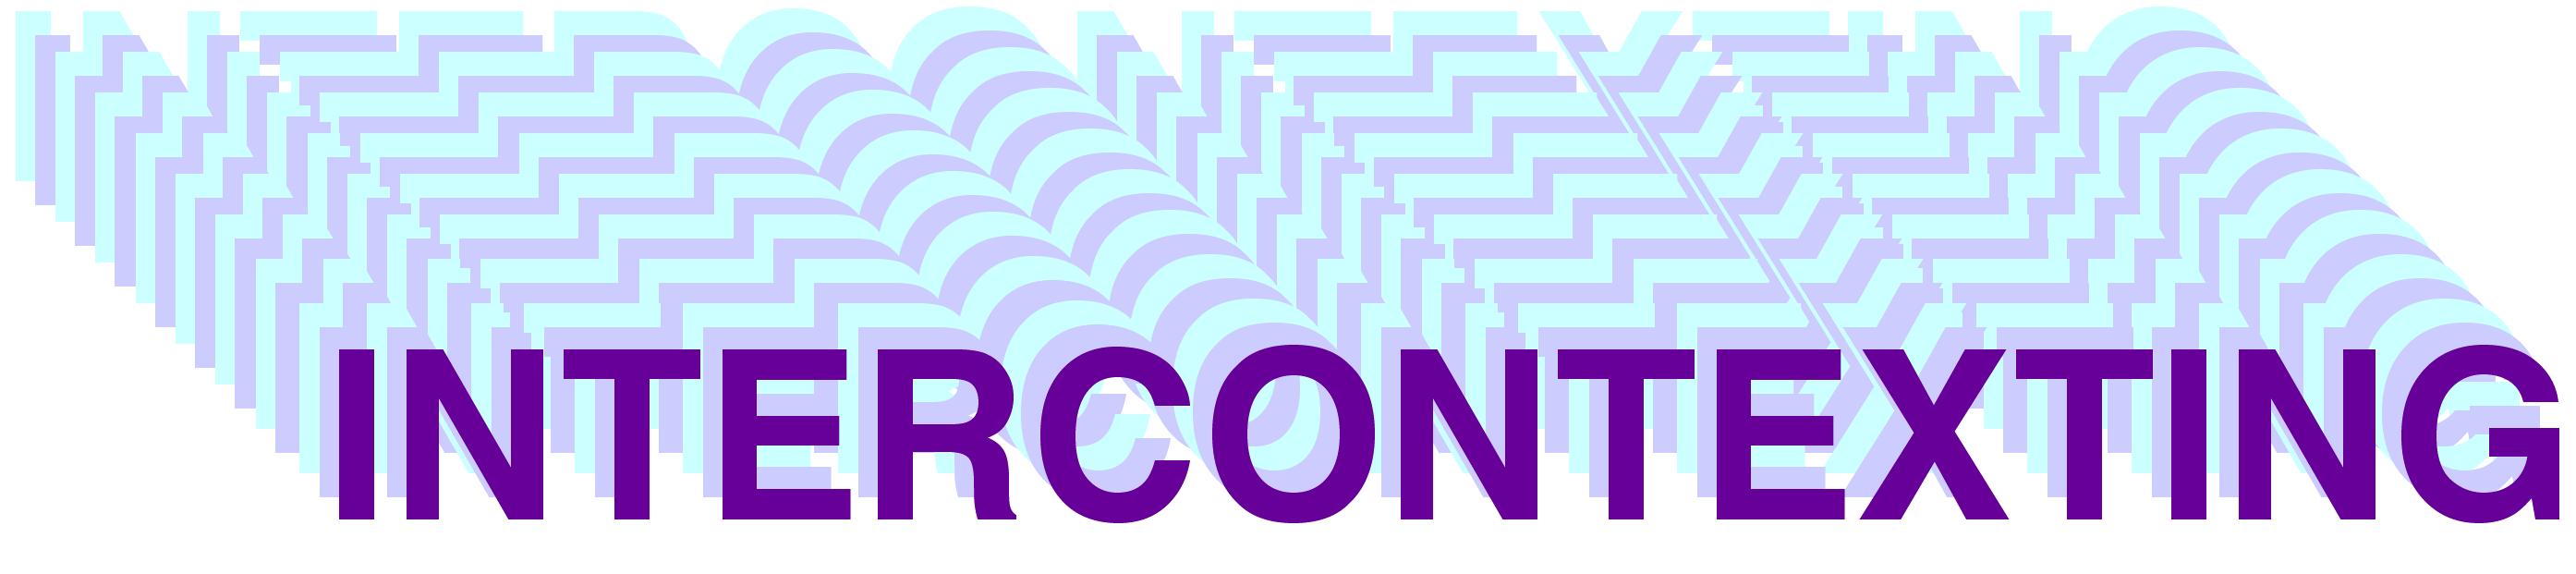 Intercontexting Logo